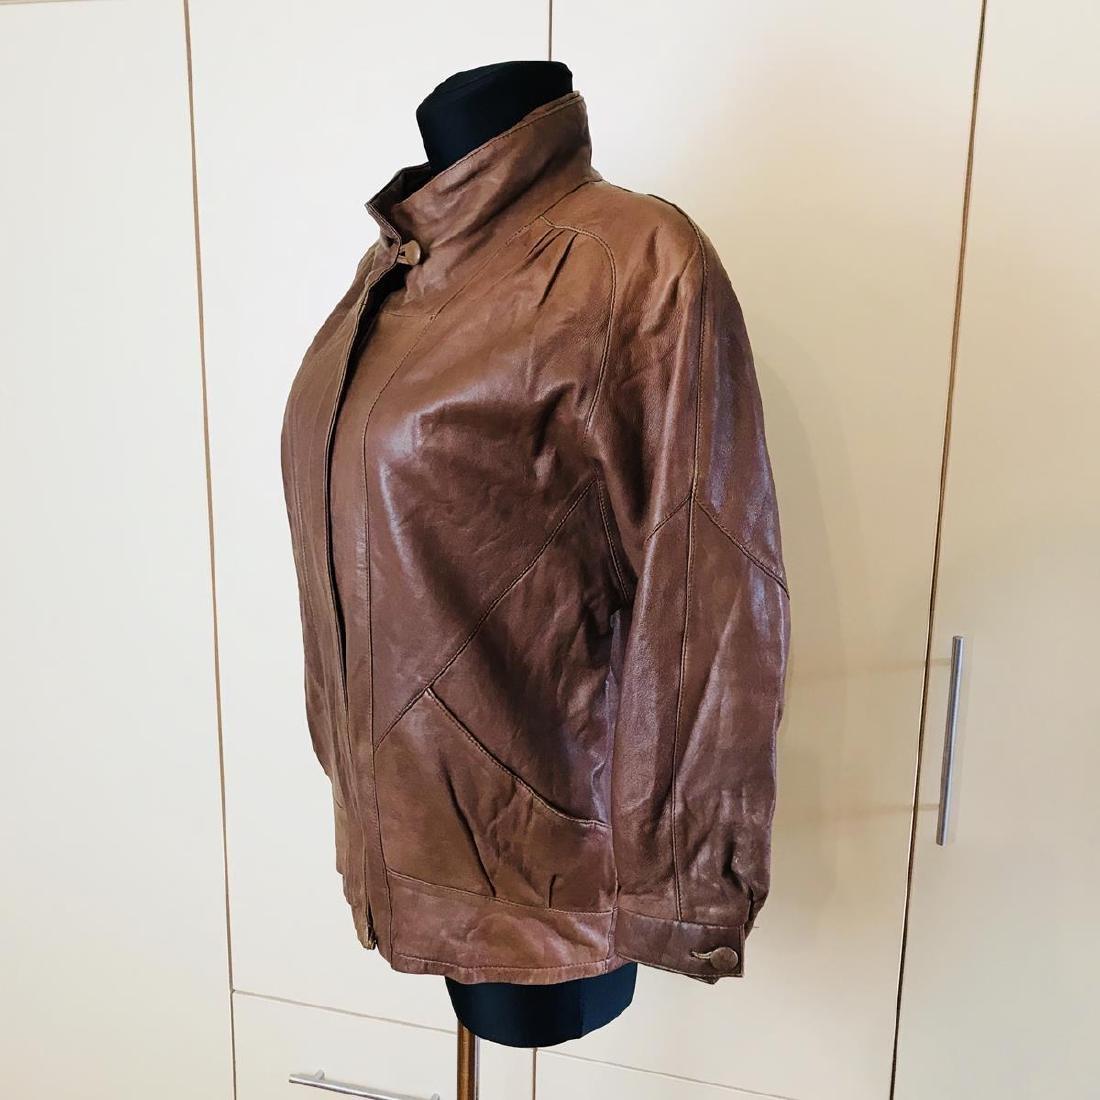 Vintage Women's Leather Jacket Coat - 4